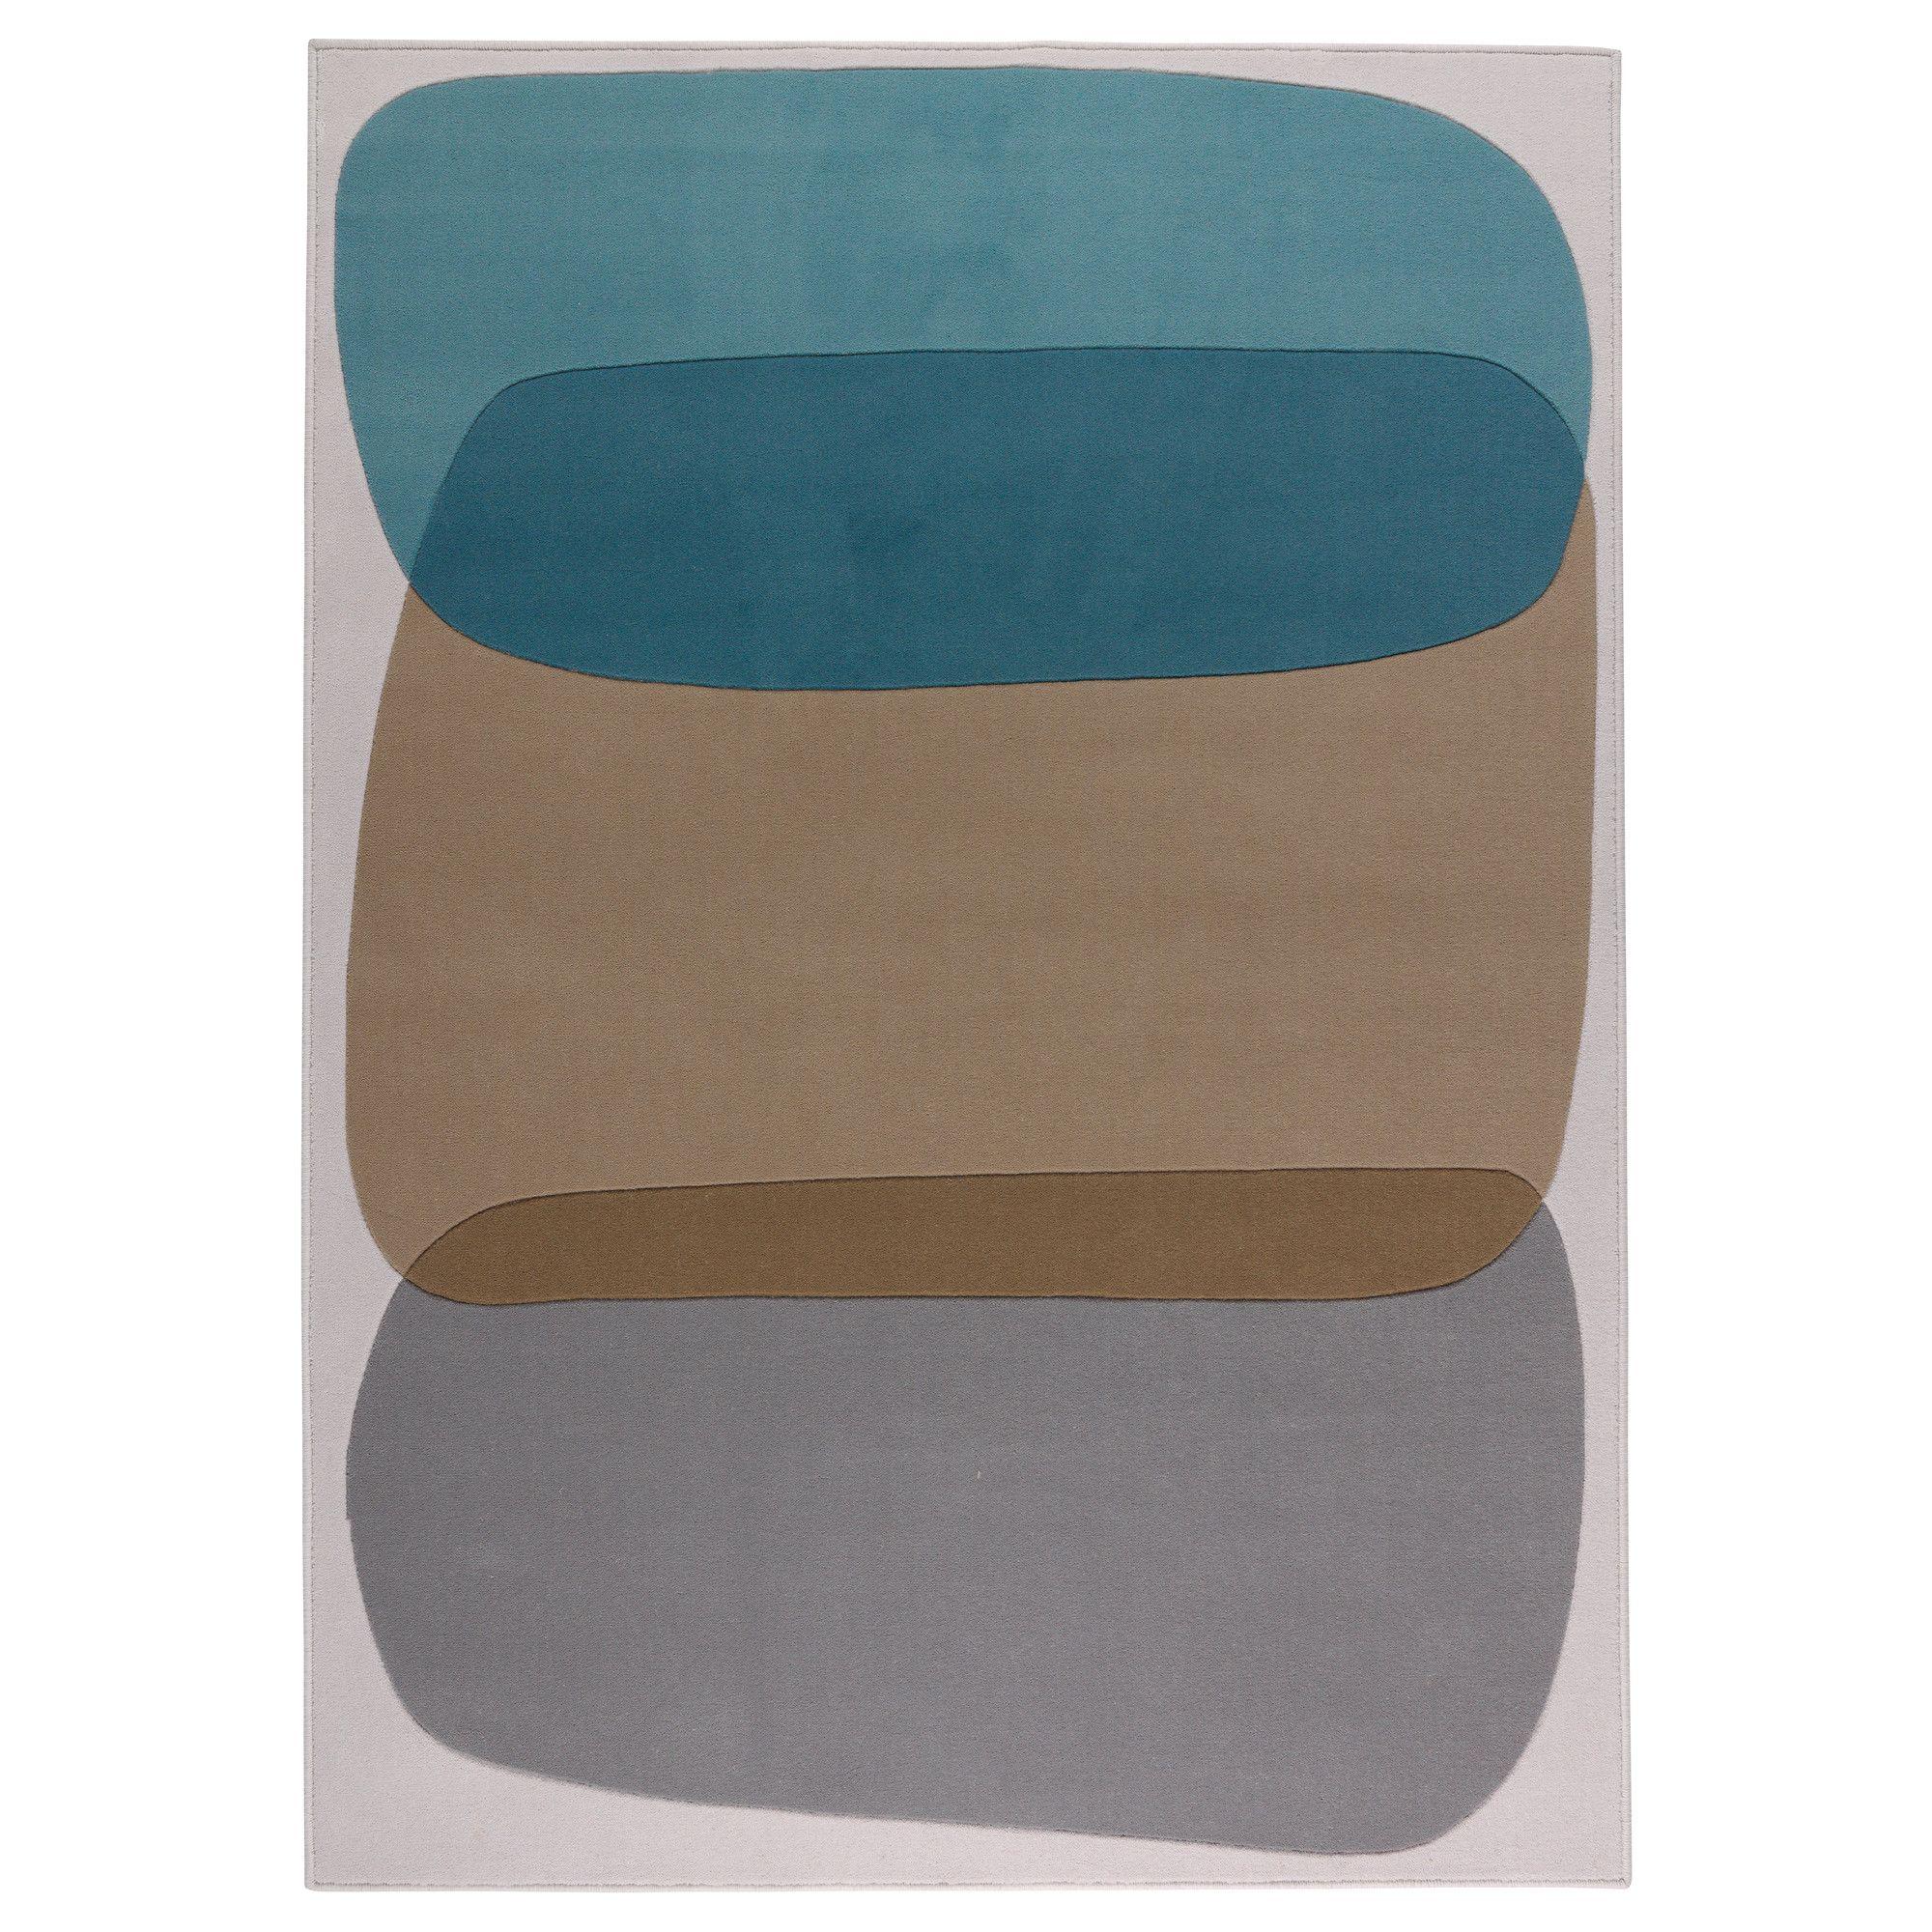 ikea malin figur tapis poils ras turquoise 279 r f rence de l 39 article dimensions. Black Bedroom Furniture Sets. Home Design Ideas